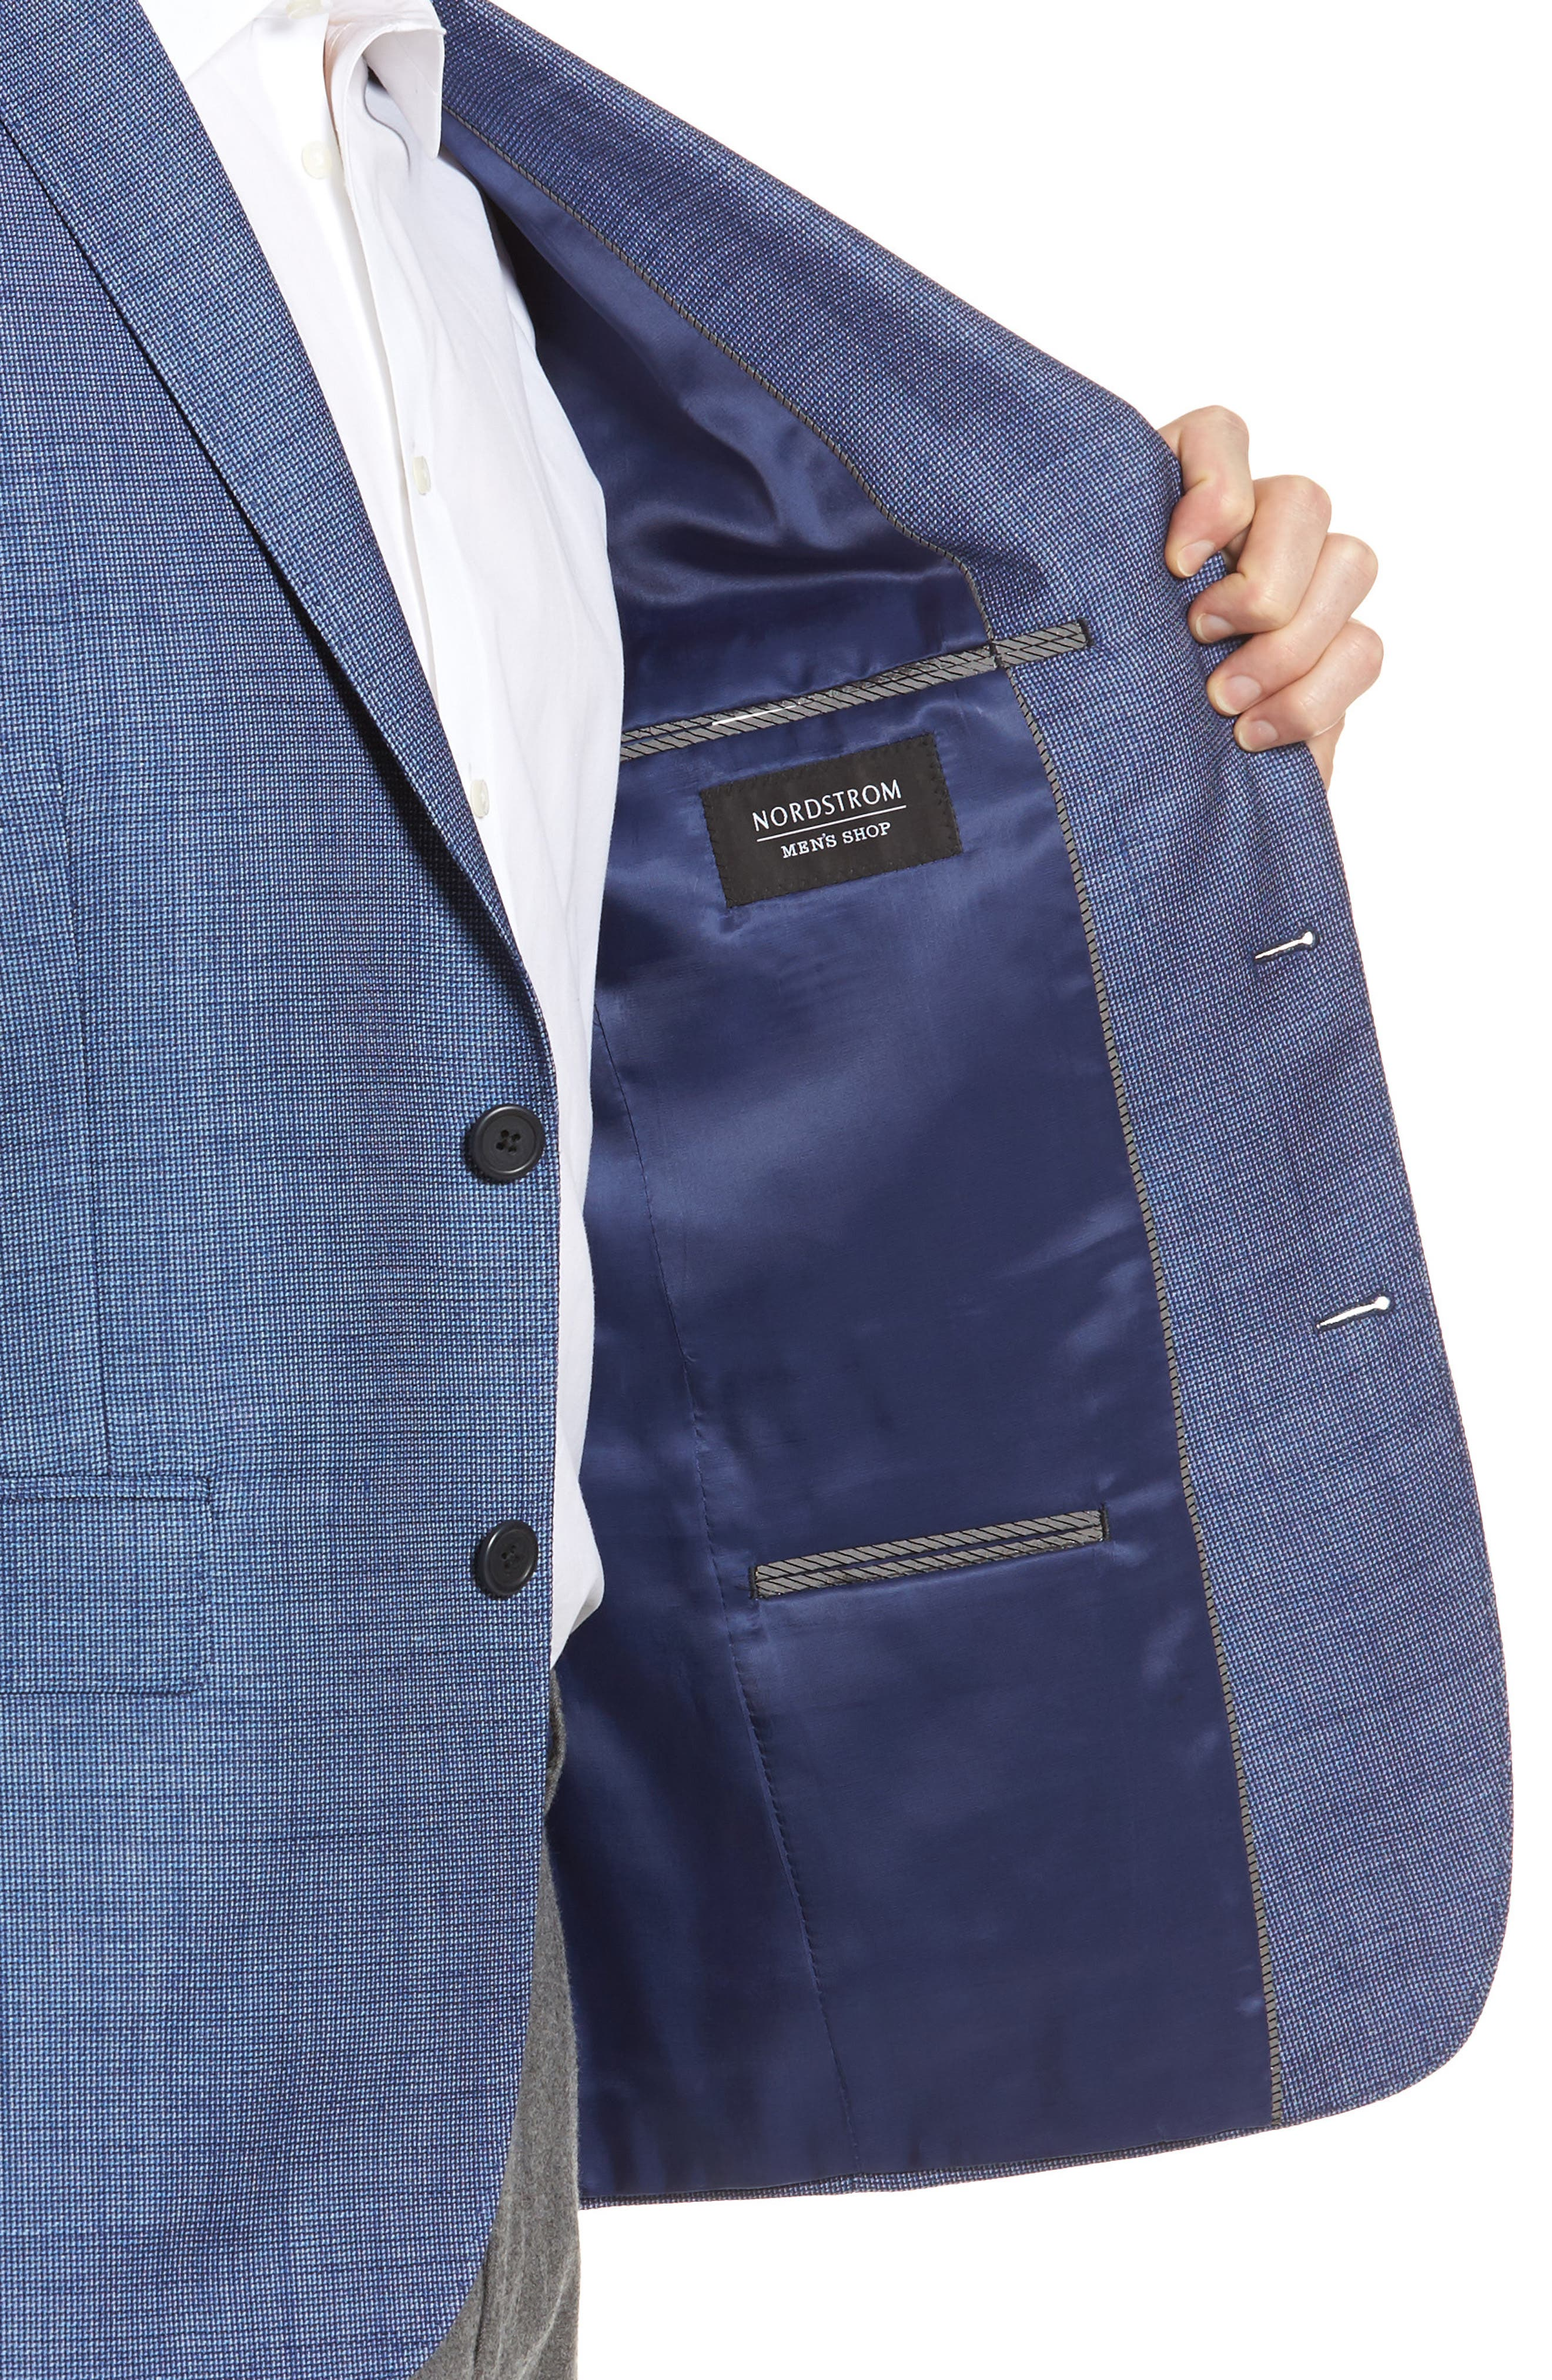 Extra Trim Fit Wool & Linen Blazer,                             Alternate thumbnail 4, color,                             401